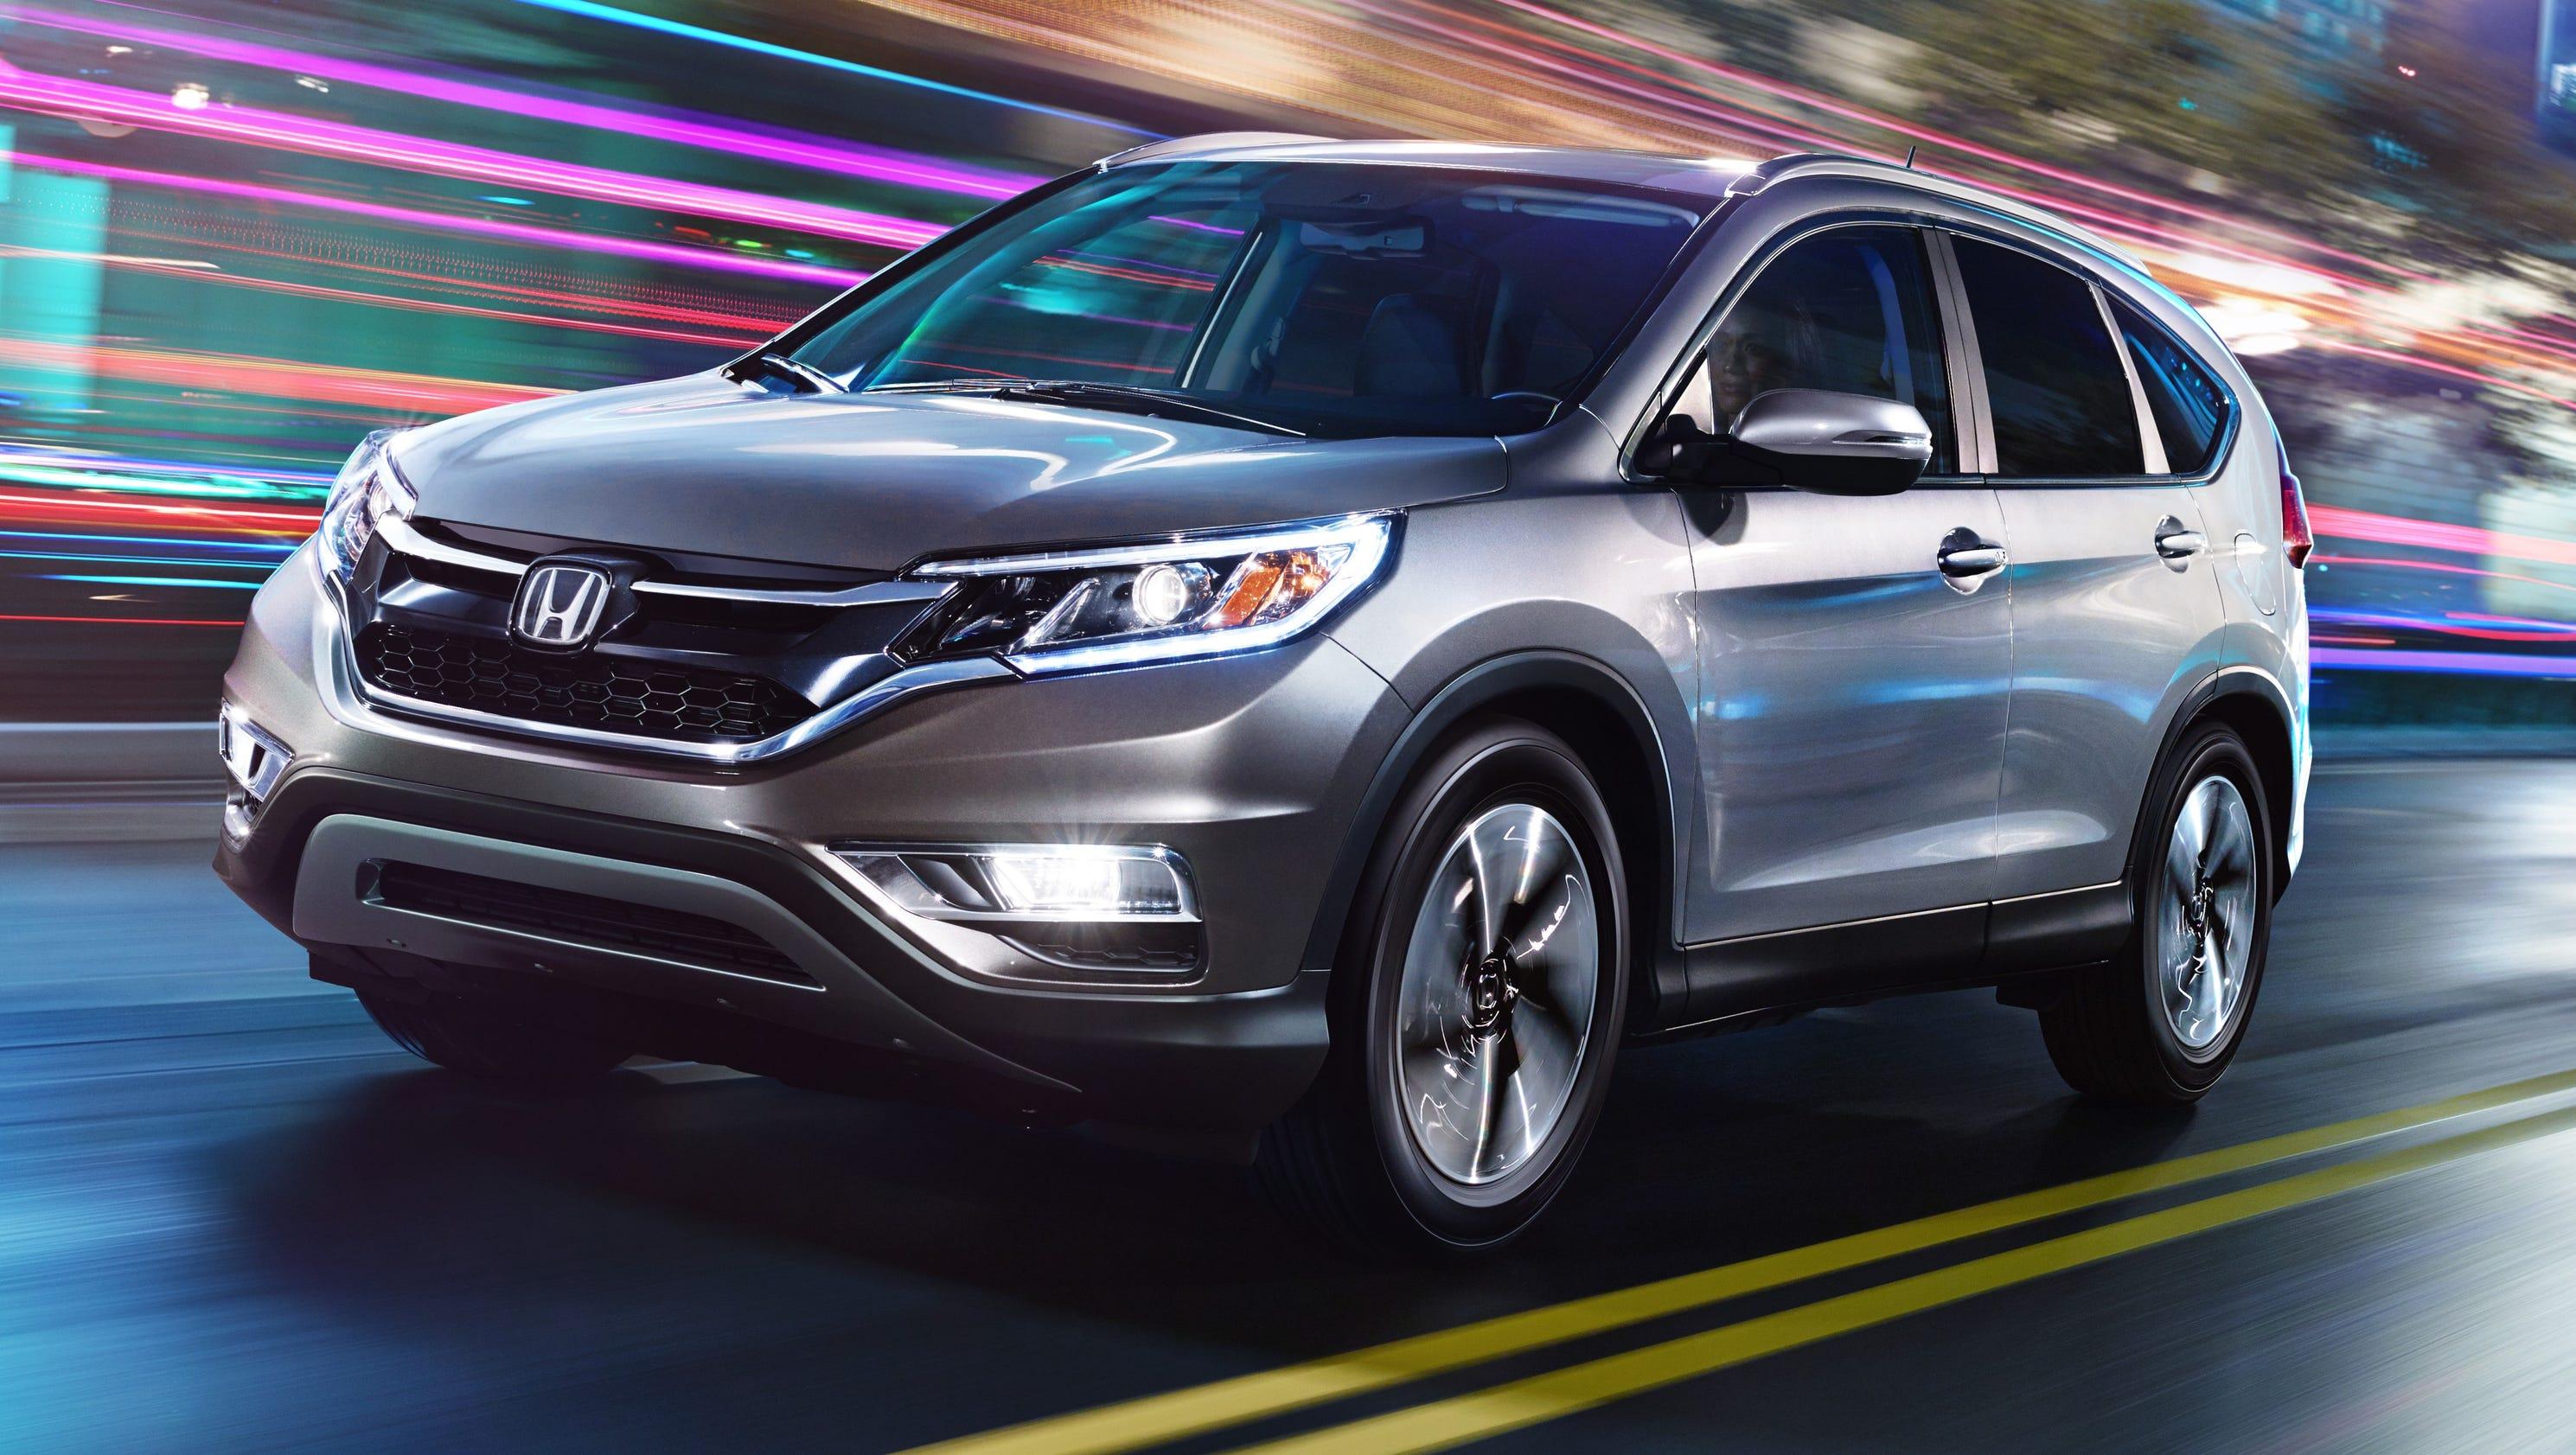 Test Drive Honda Cr V Major Updates Minor Flair